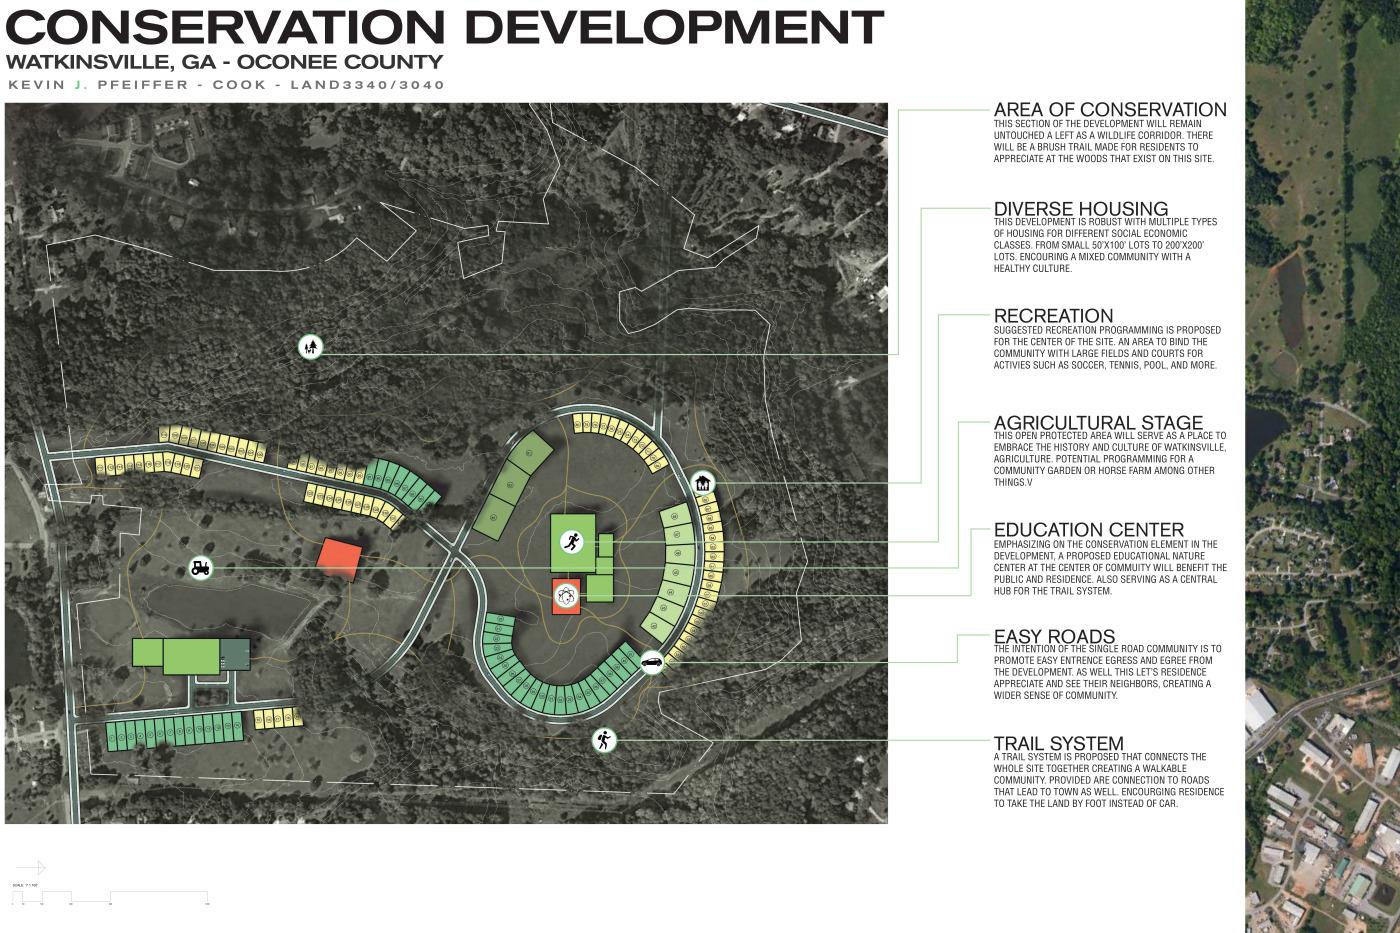 Conservation Development